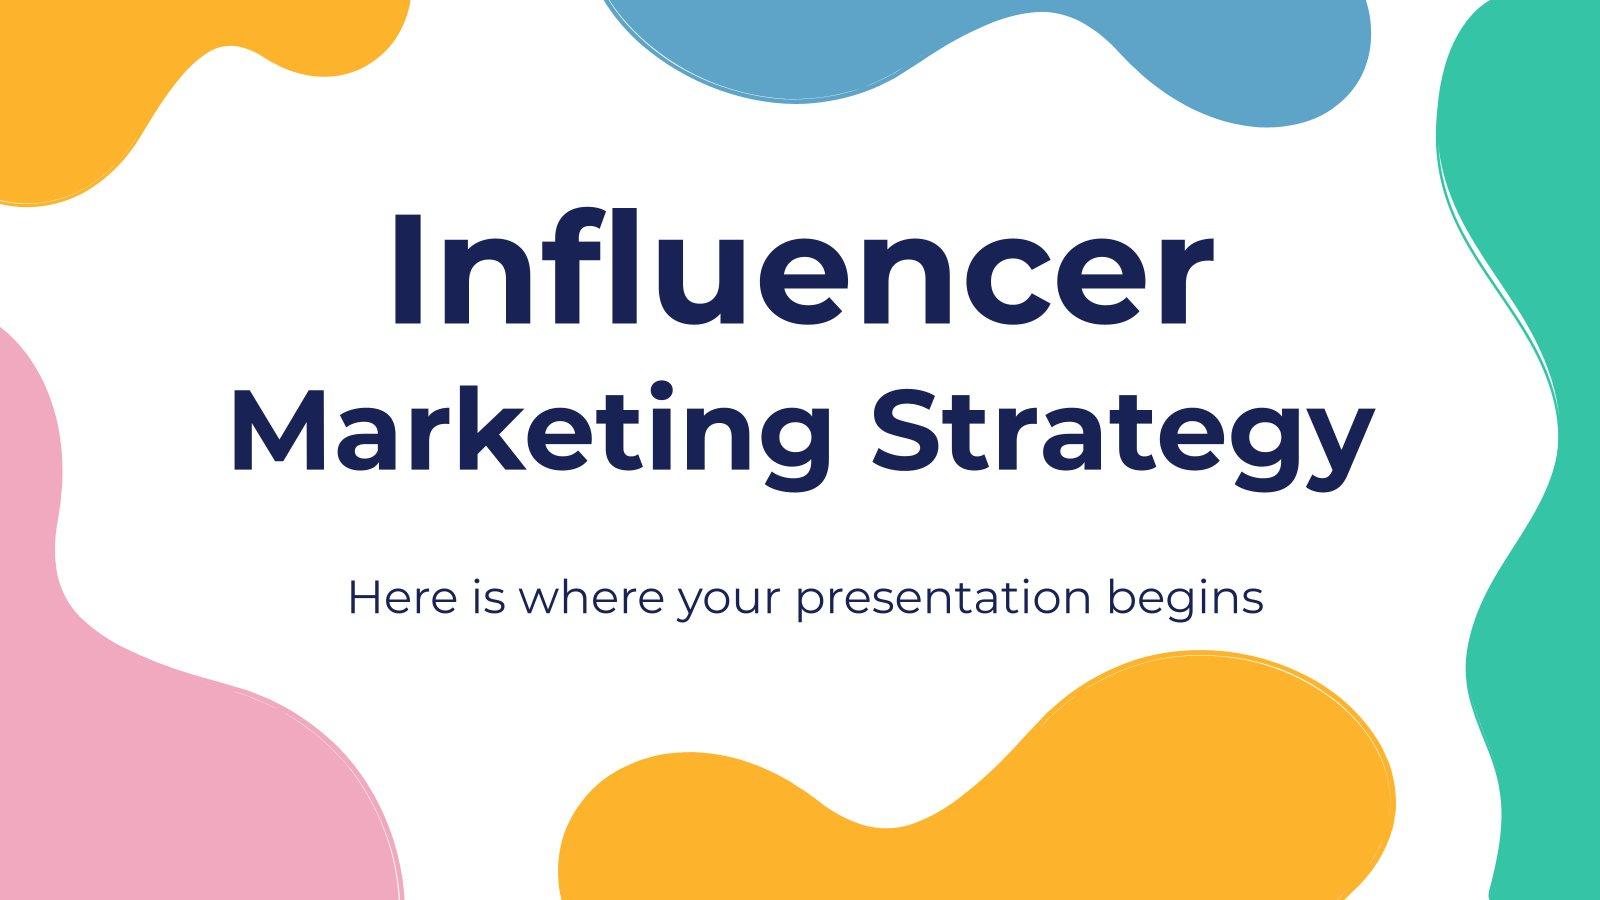 Influencer Marketing Strategy presentation template